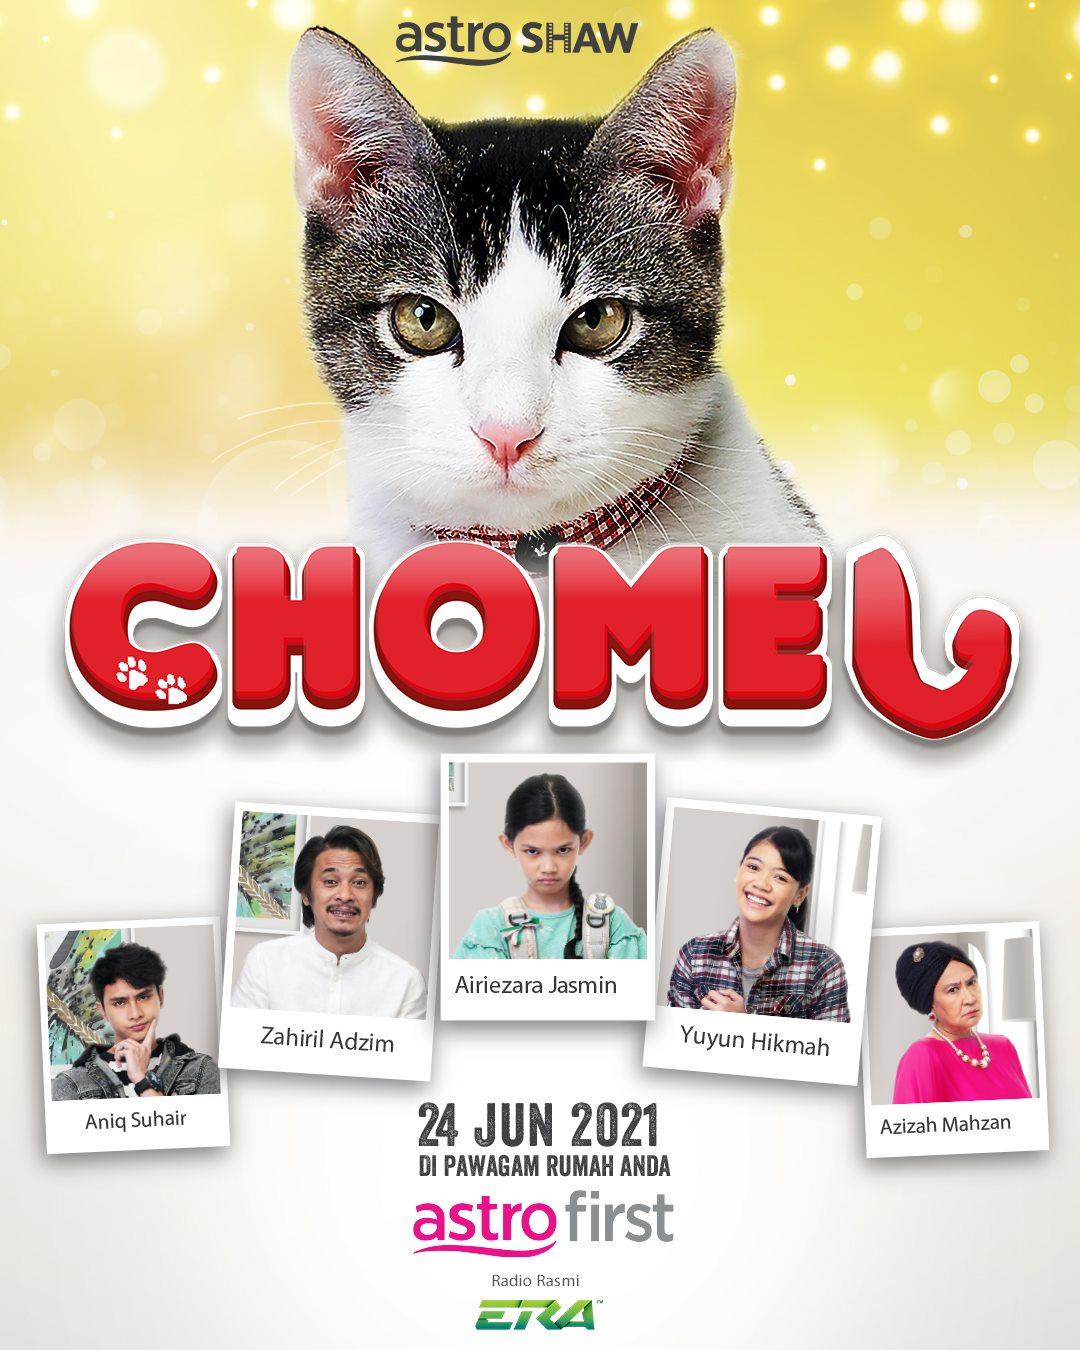 Filem Chomel Astro First 480